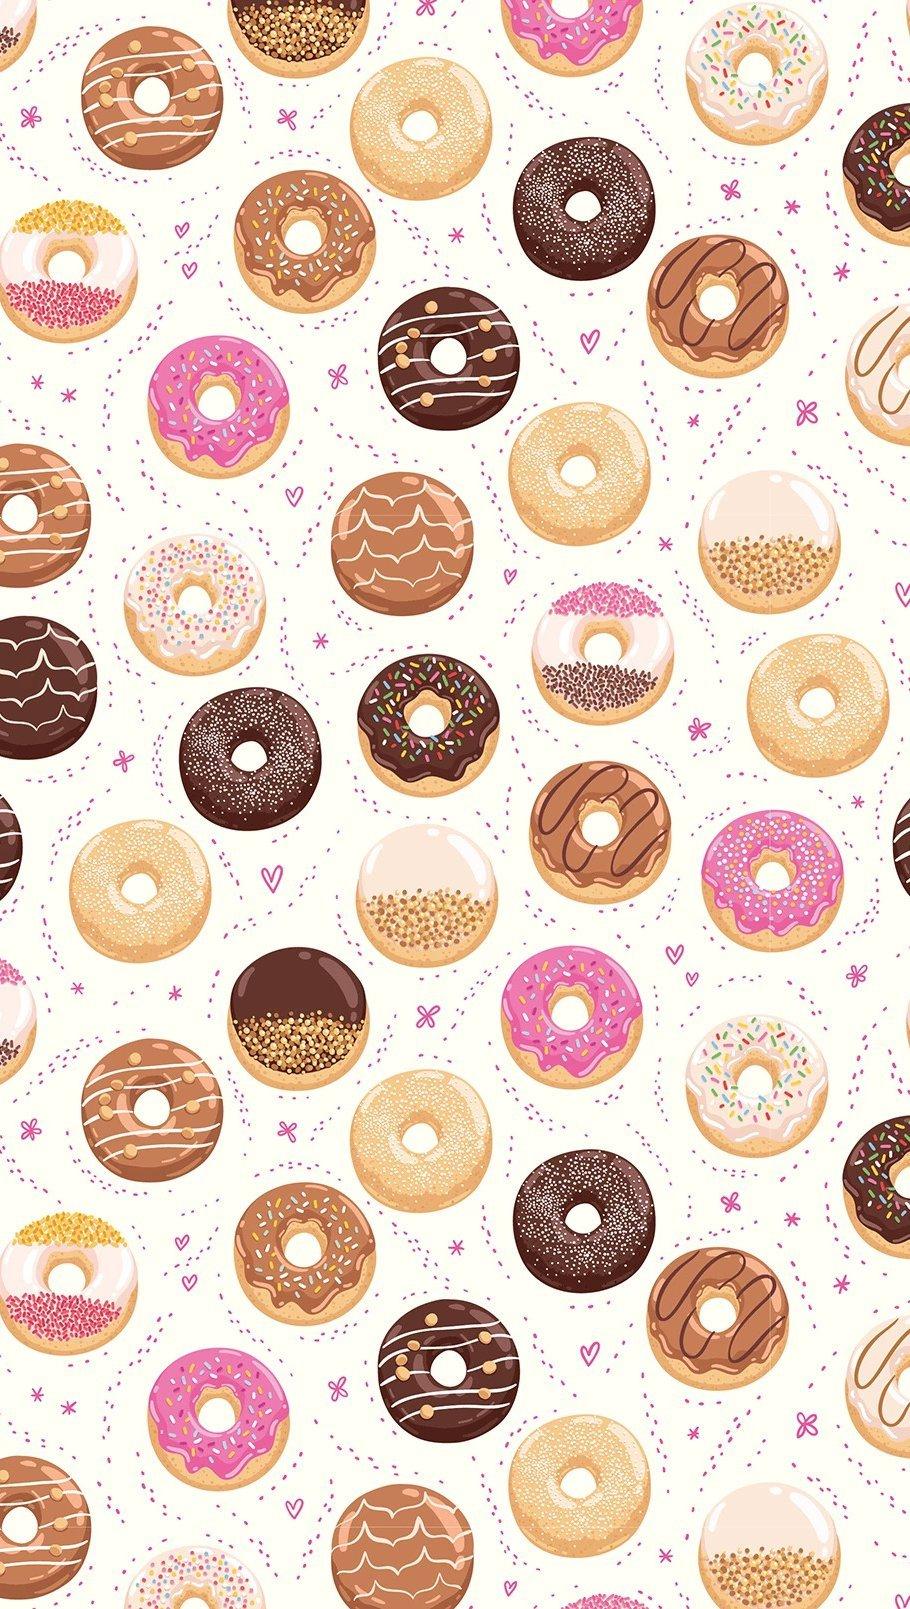 Wallpaper Kiut Donuts Pattern Vertical